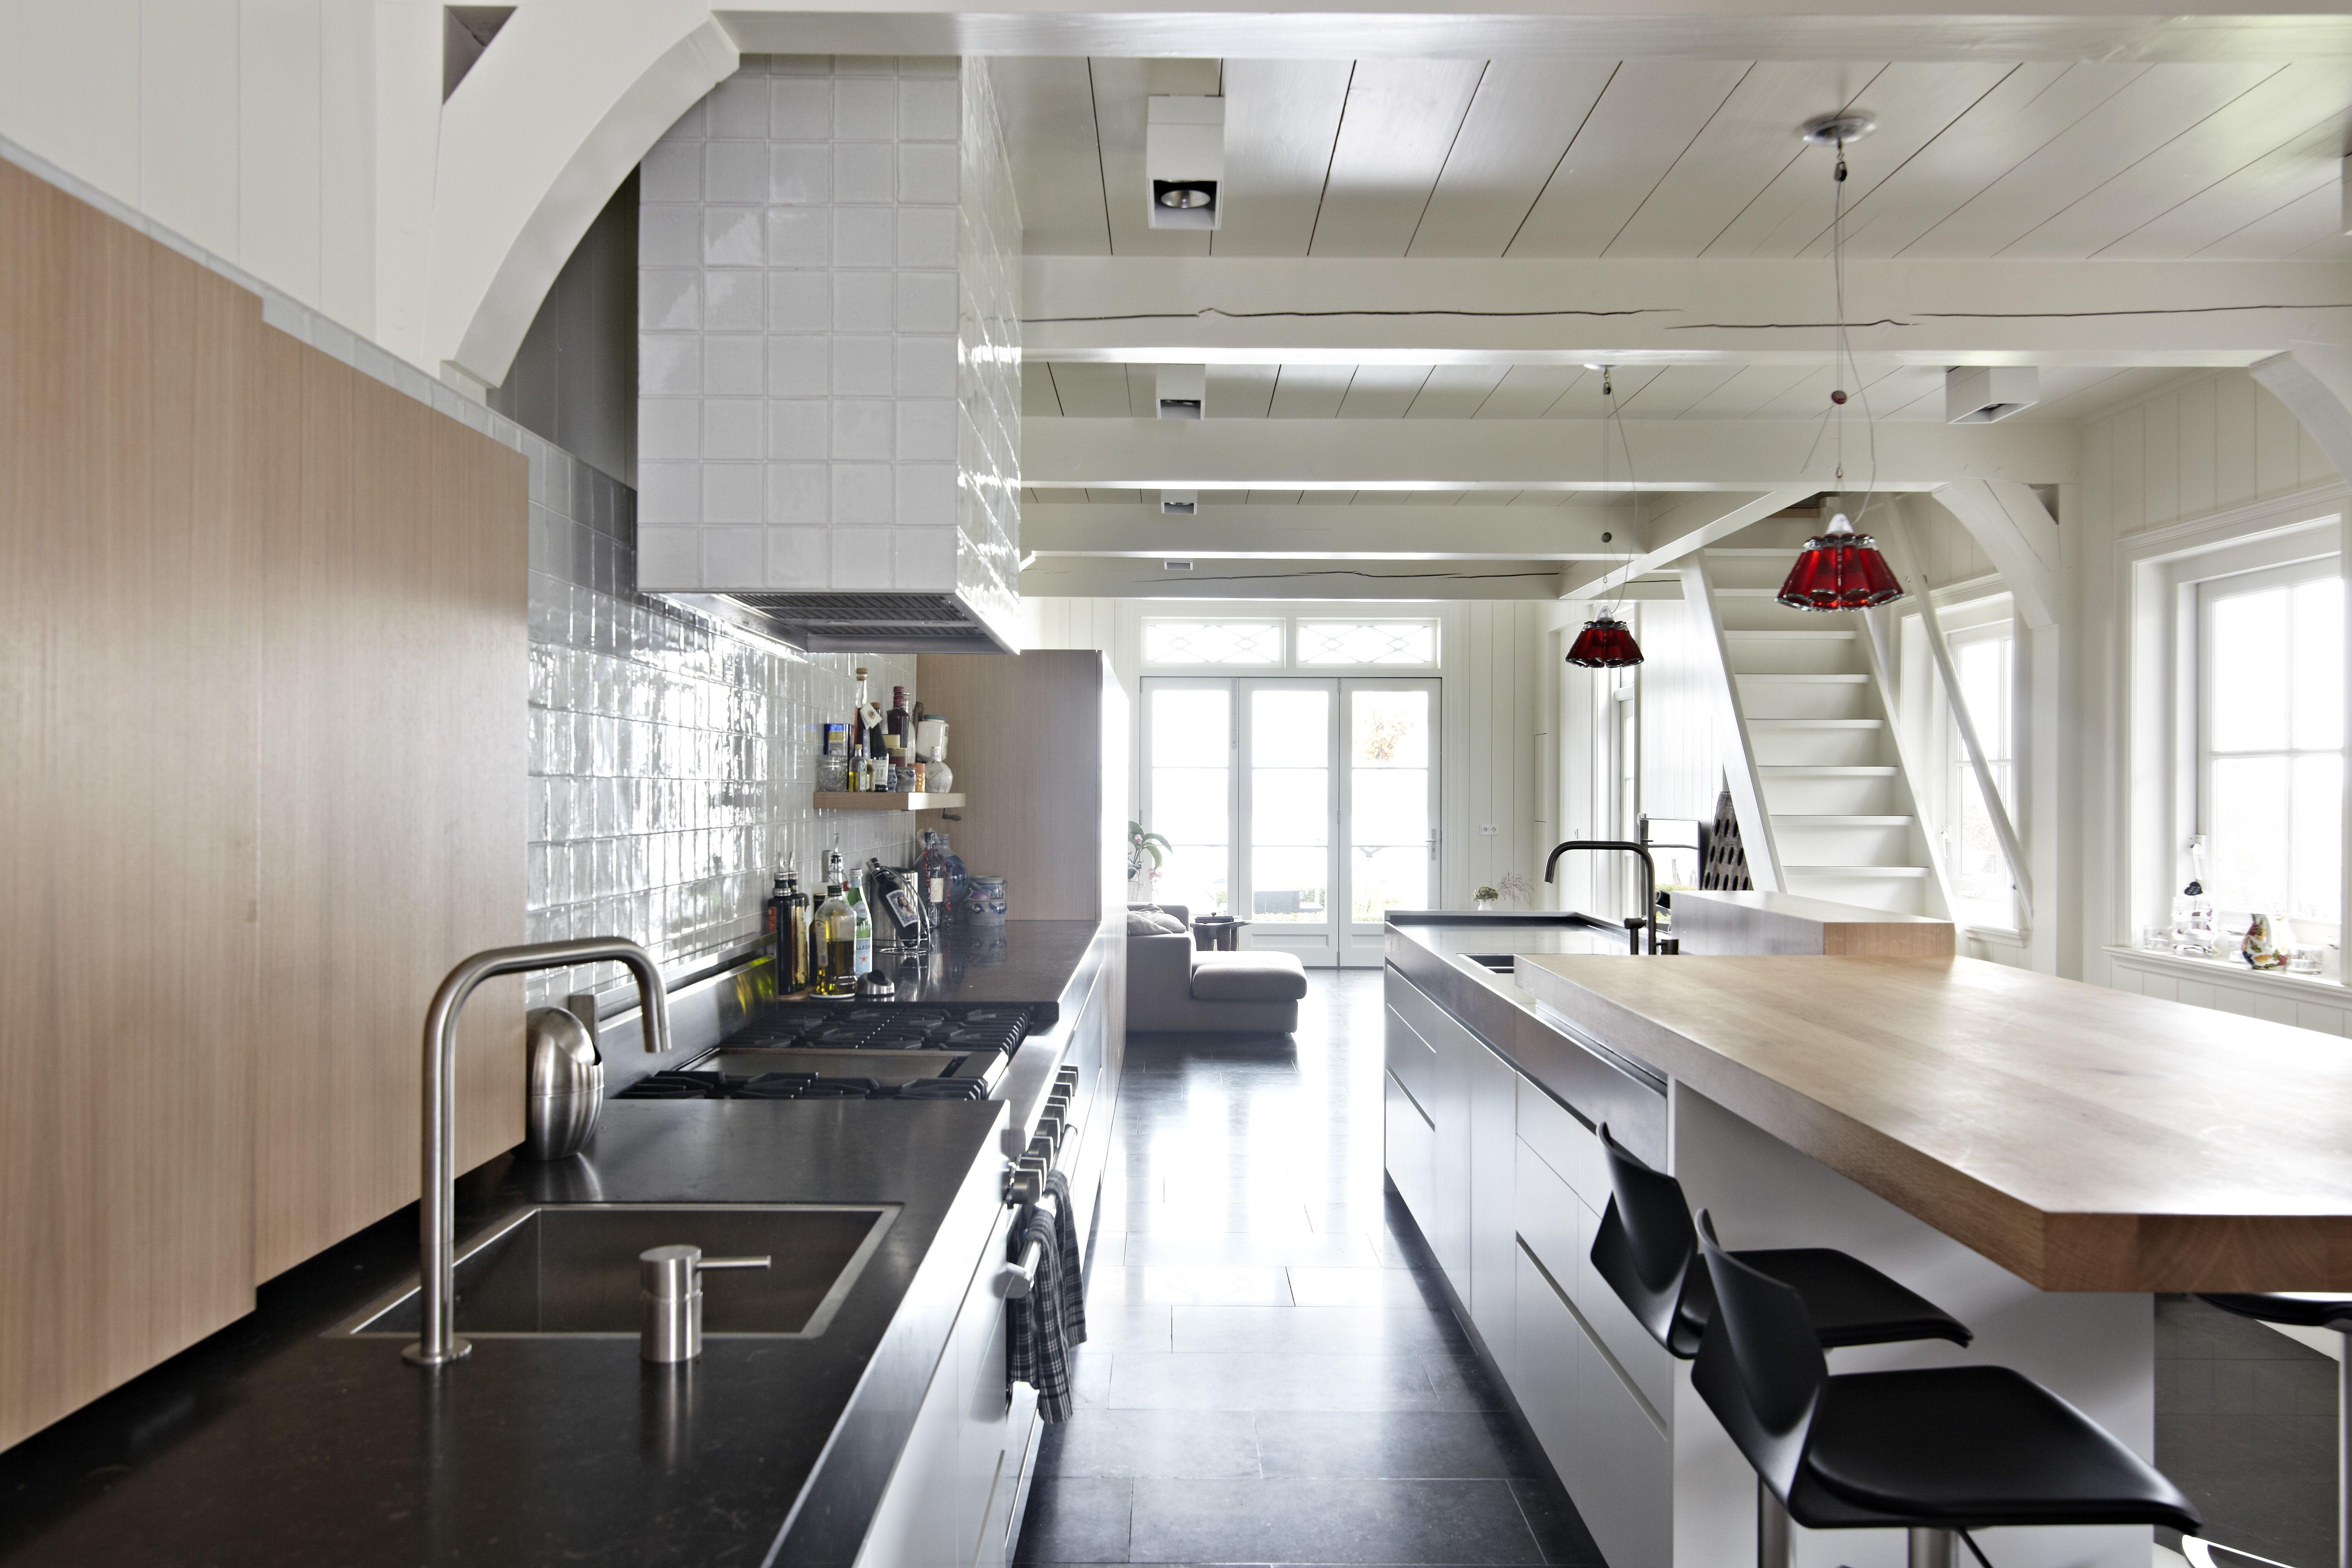 keuken #balken #plafond #eiken #hout #landelijke #stijl #tegel ...